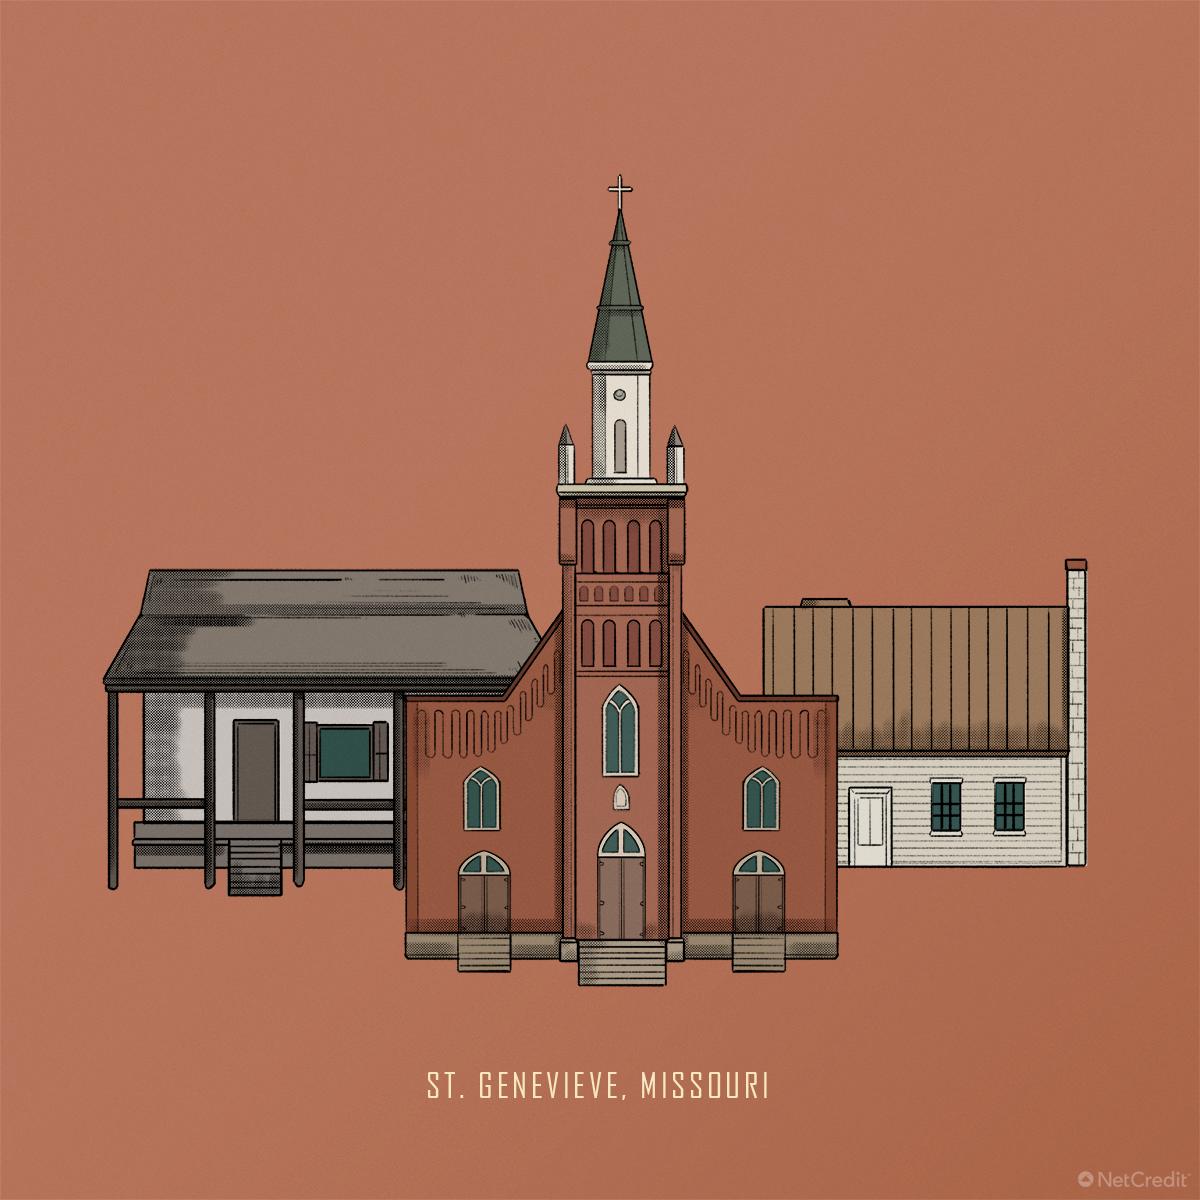 St. Genevieve, Missouri